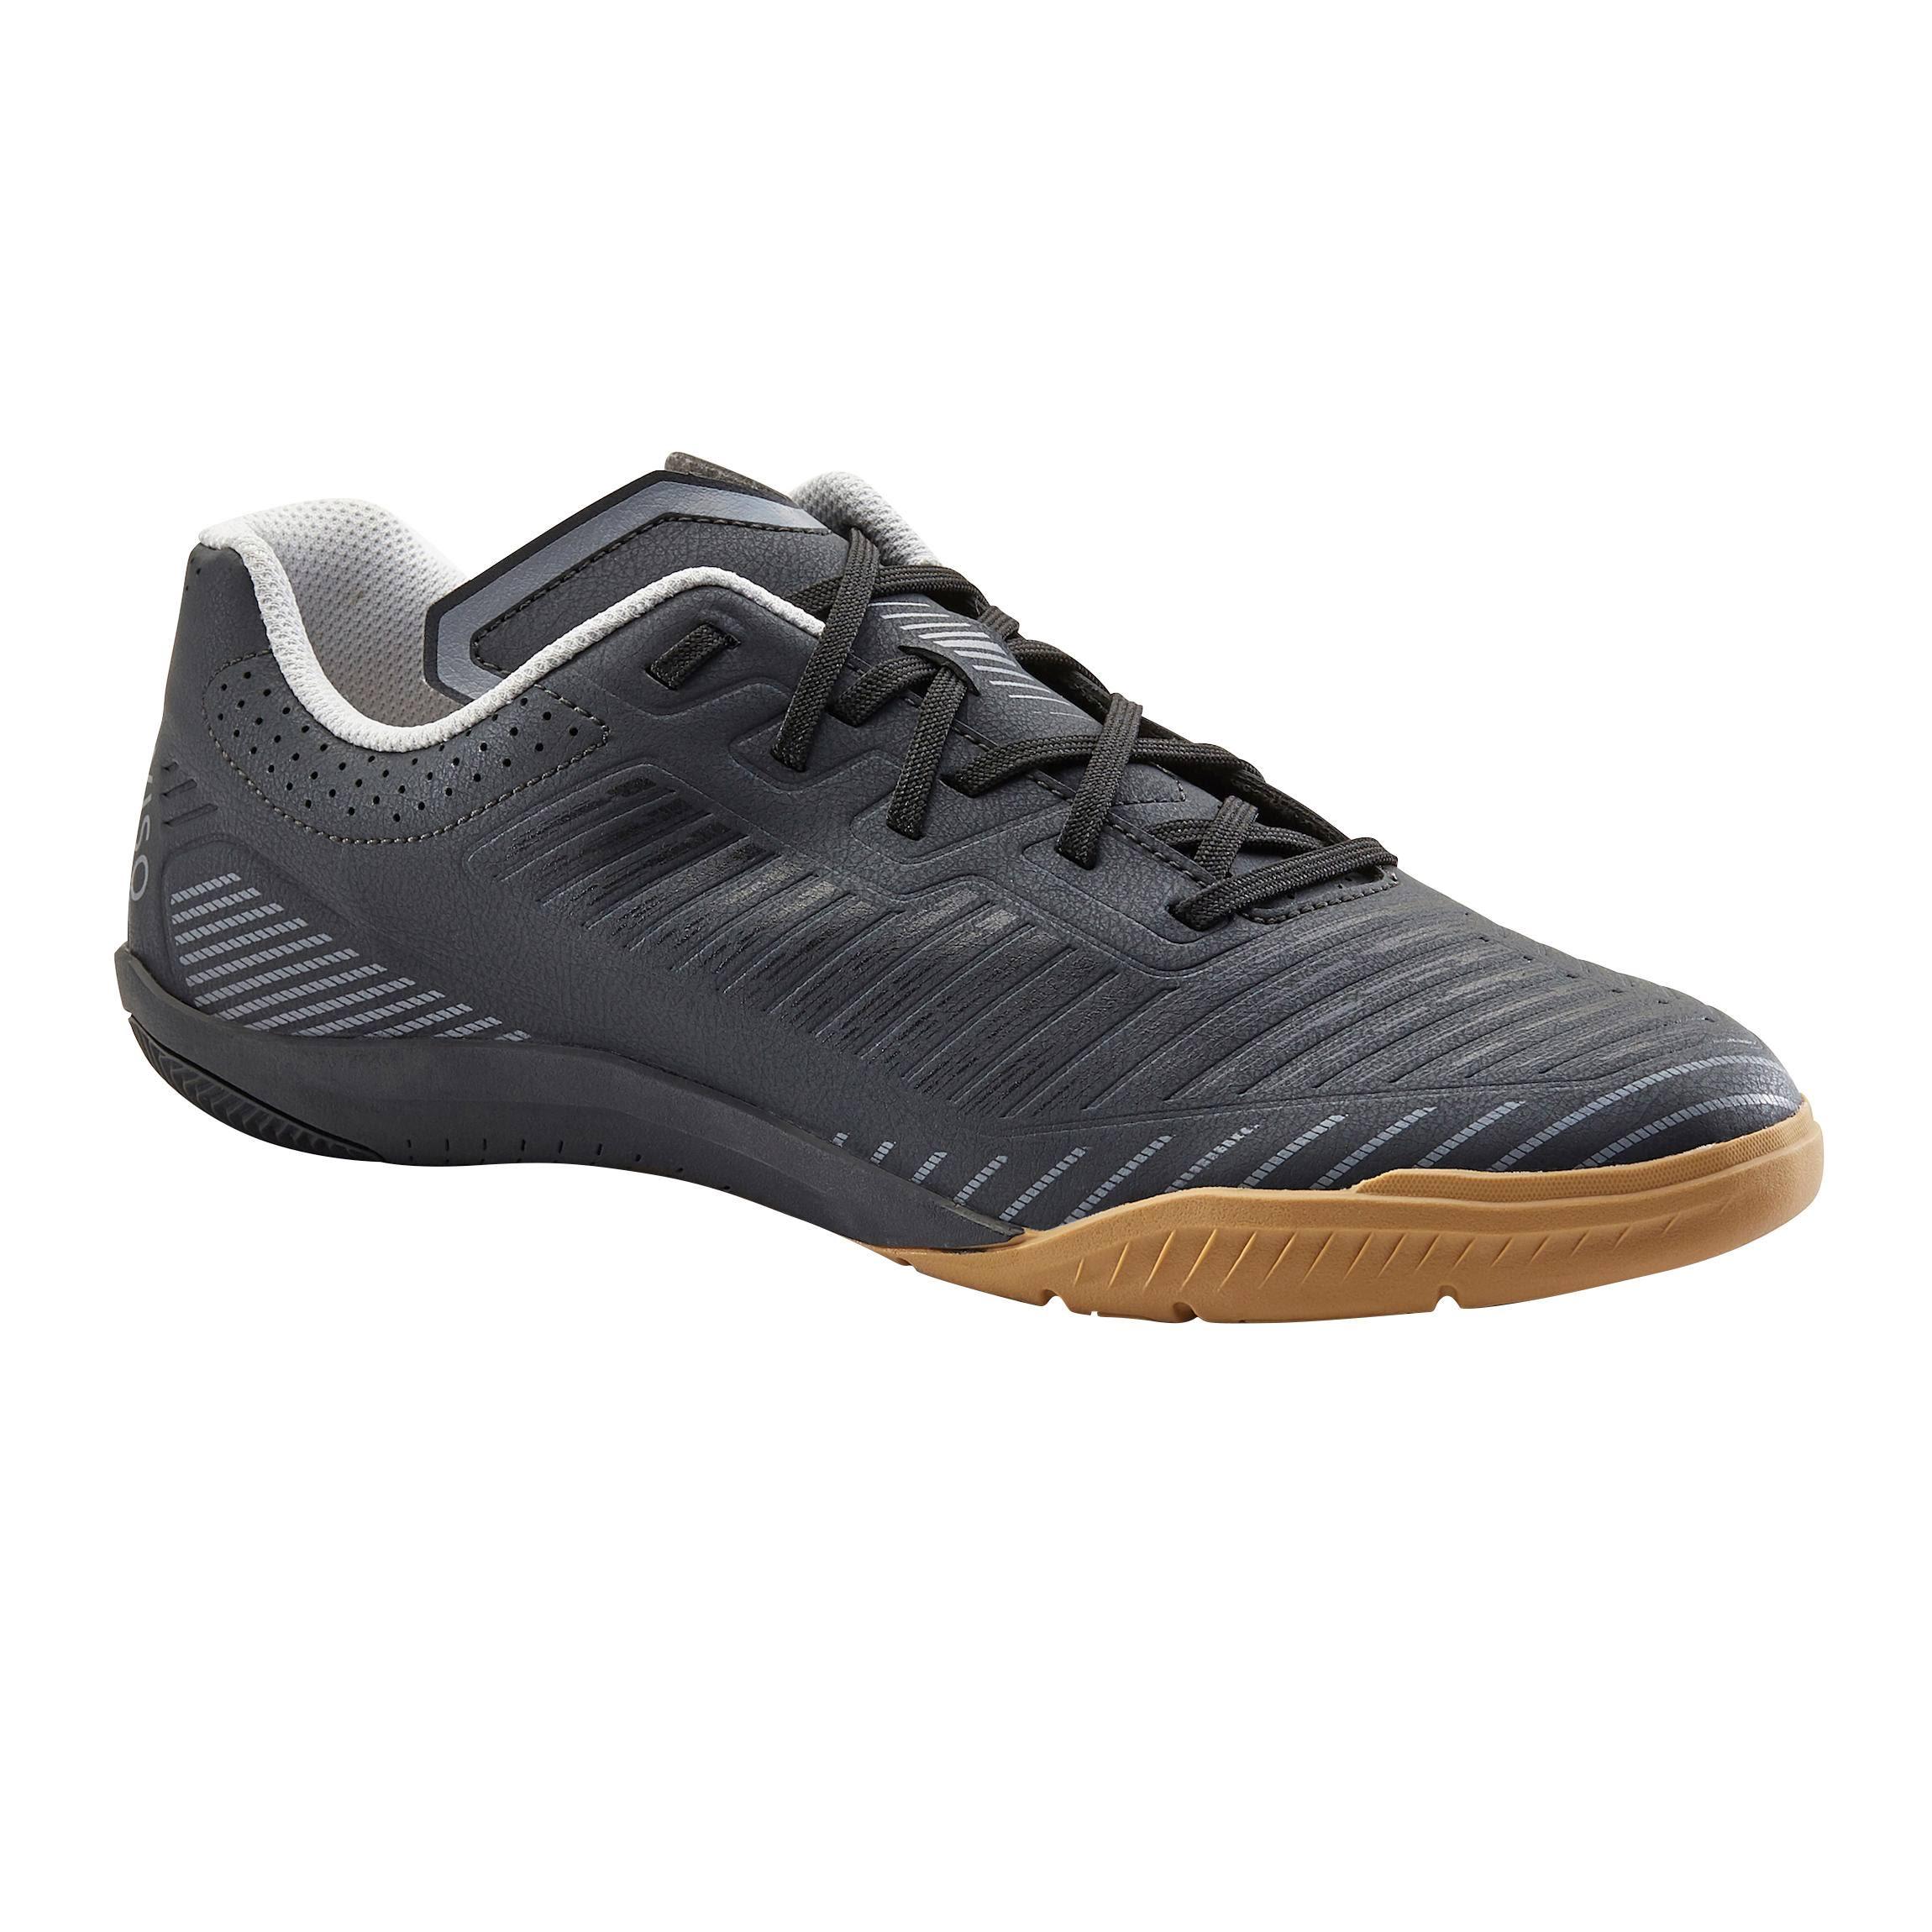 Imviso Futsal Shoes Ginka 500 - Light Grey